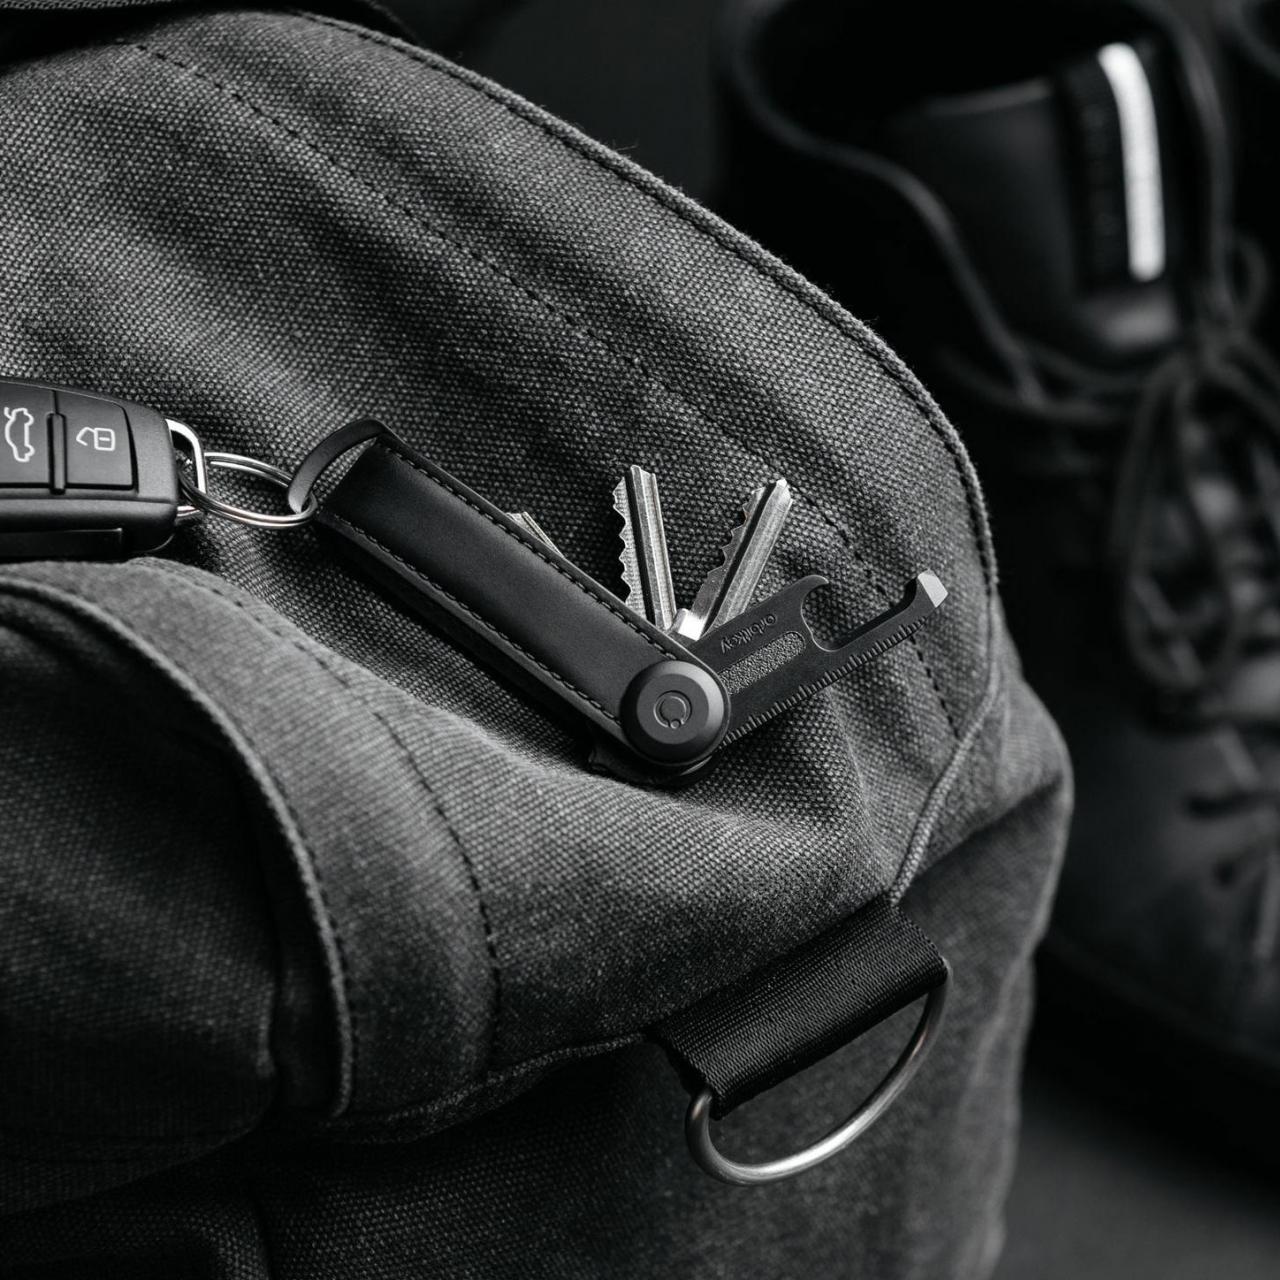 Orbitkey 2.0 Saffiano All Black Limited Edition